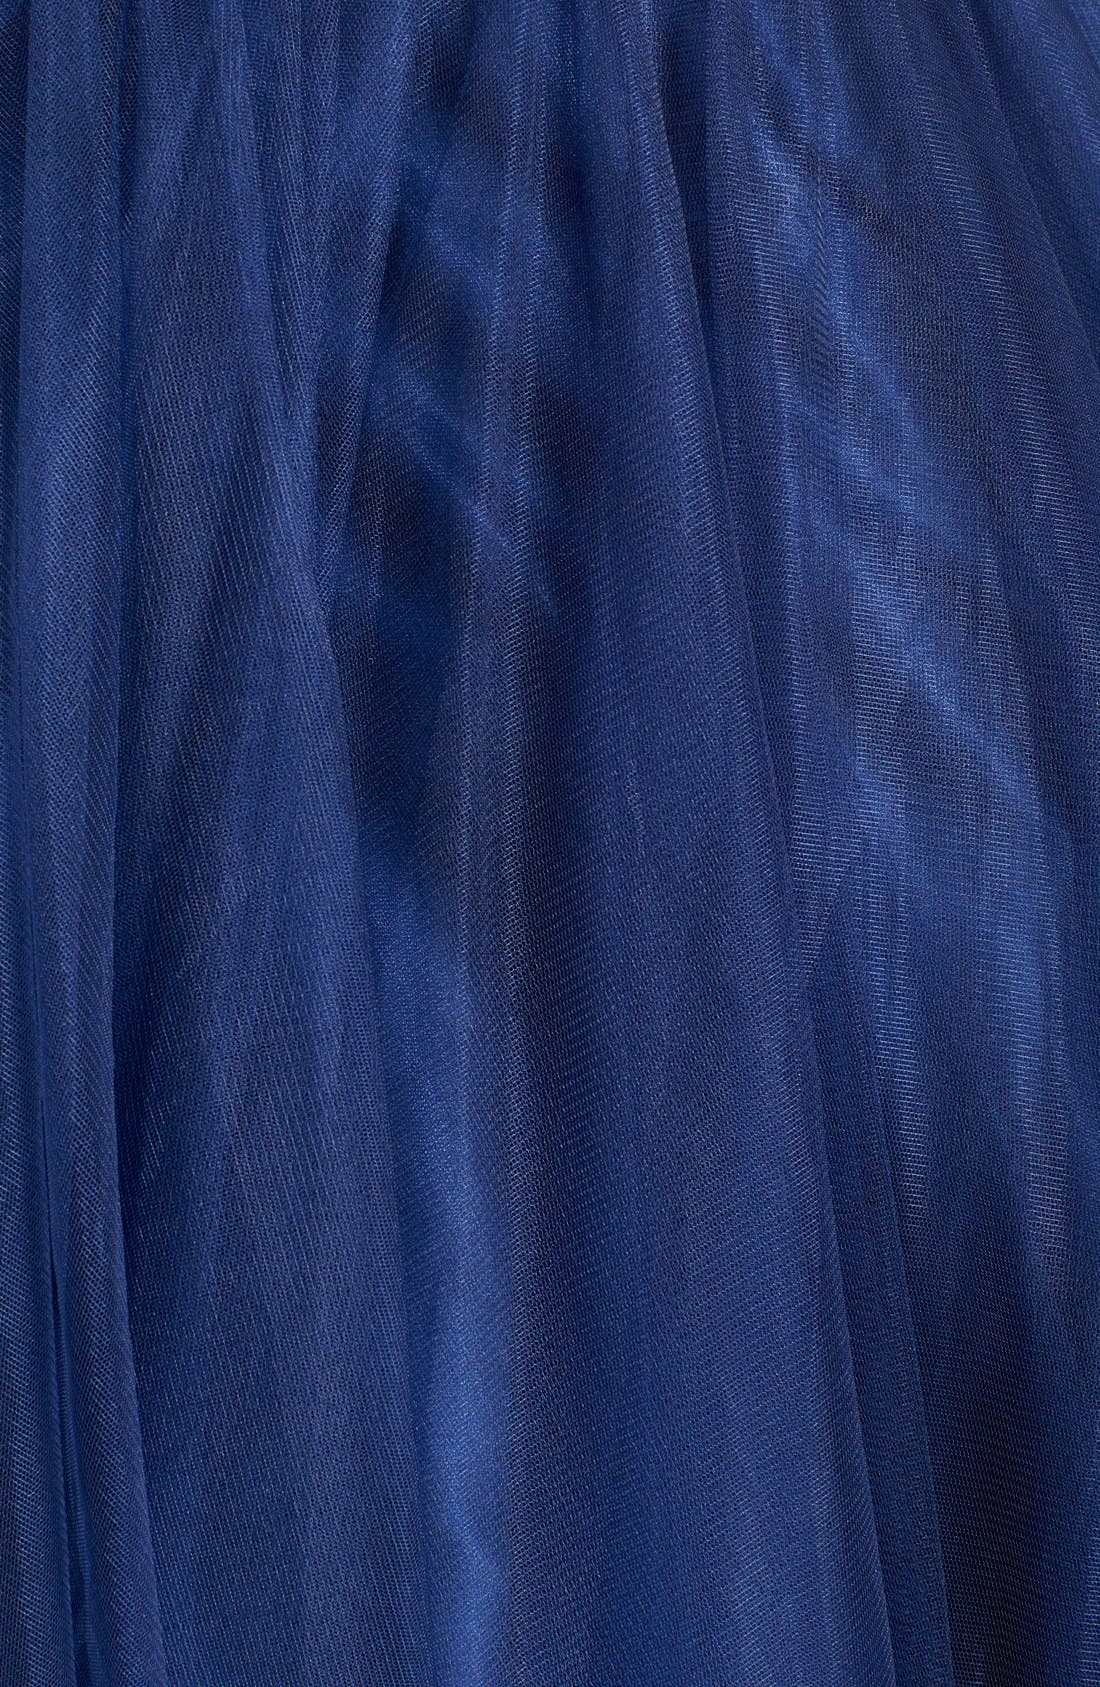 Alternate Image 5  - JVN by Jovani Embellished Top & Mesh Two-Piece Ballgown